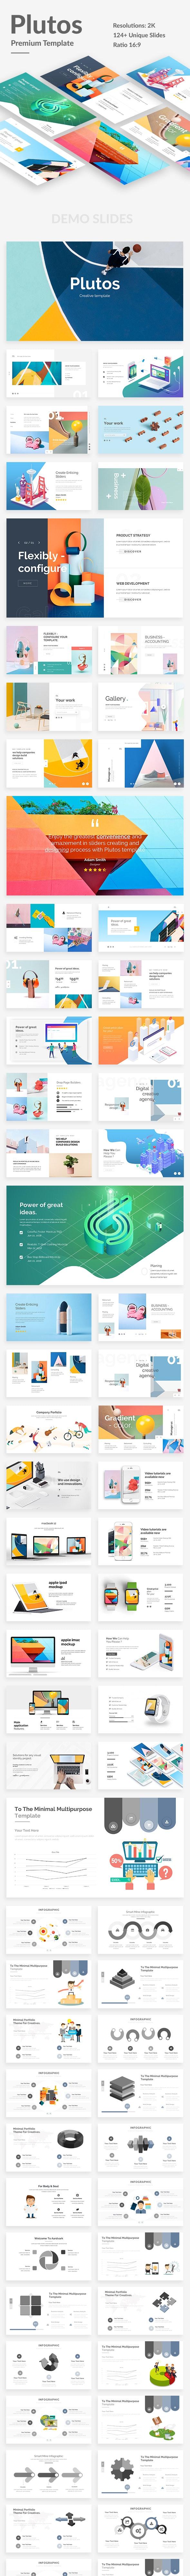 Plutos Premium Design Google Slide Template - Google Slides Presentation Templates